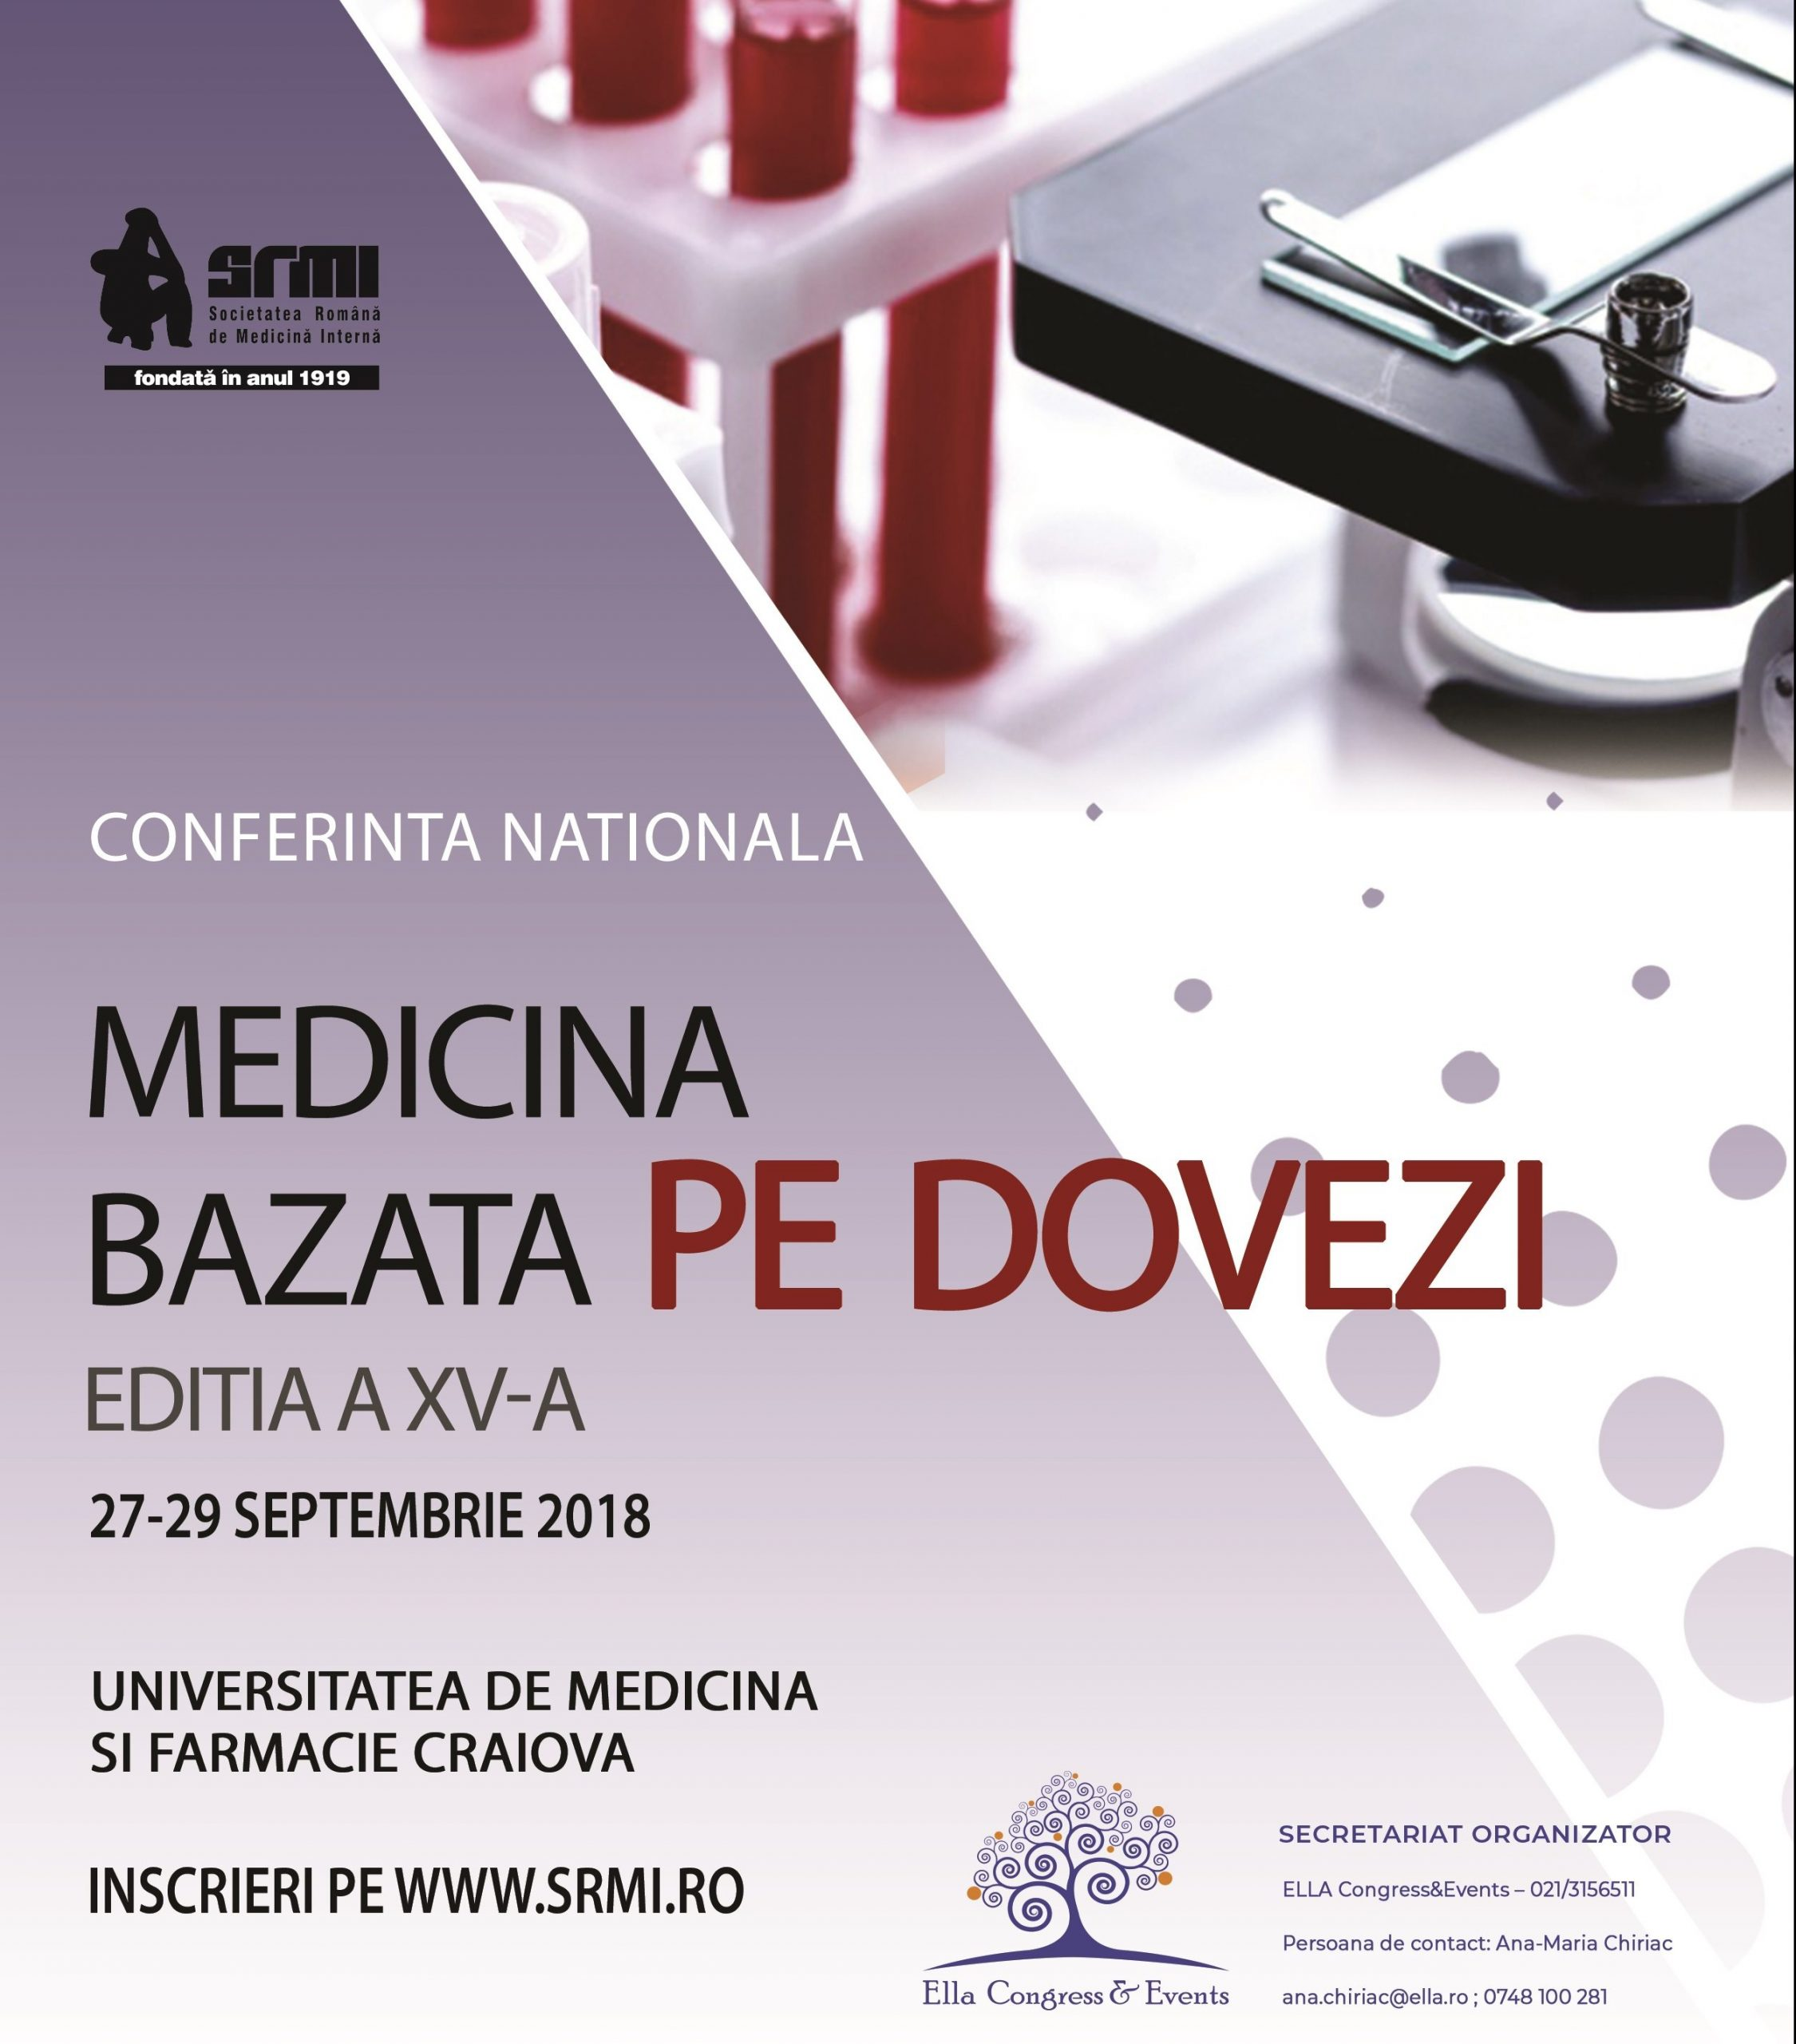 "Conferinta Nationala ""Medicina Bazata pe Dovezi"", la a 15-a editie"